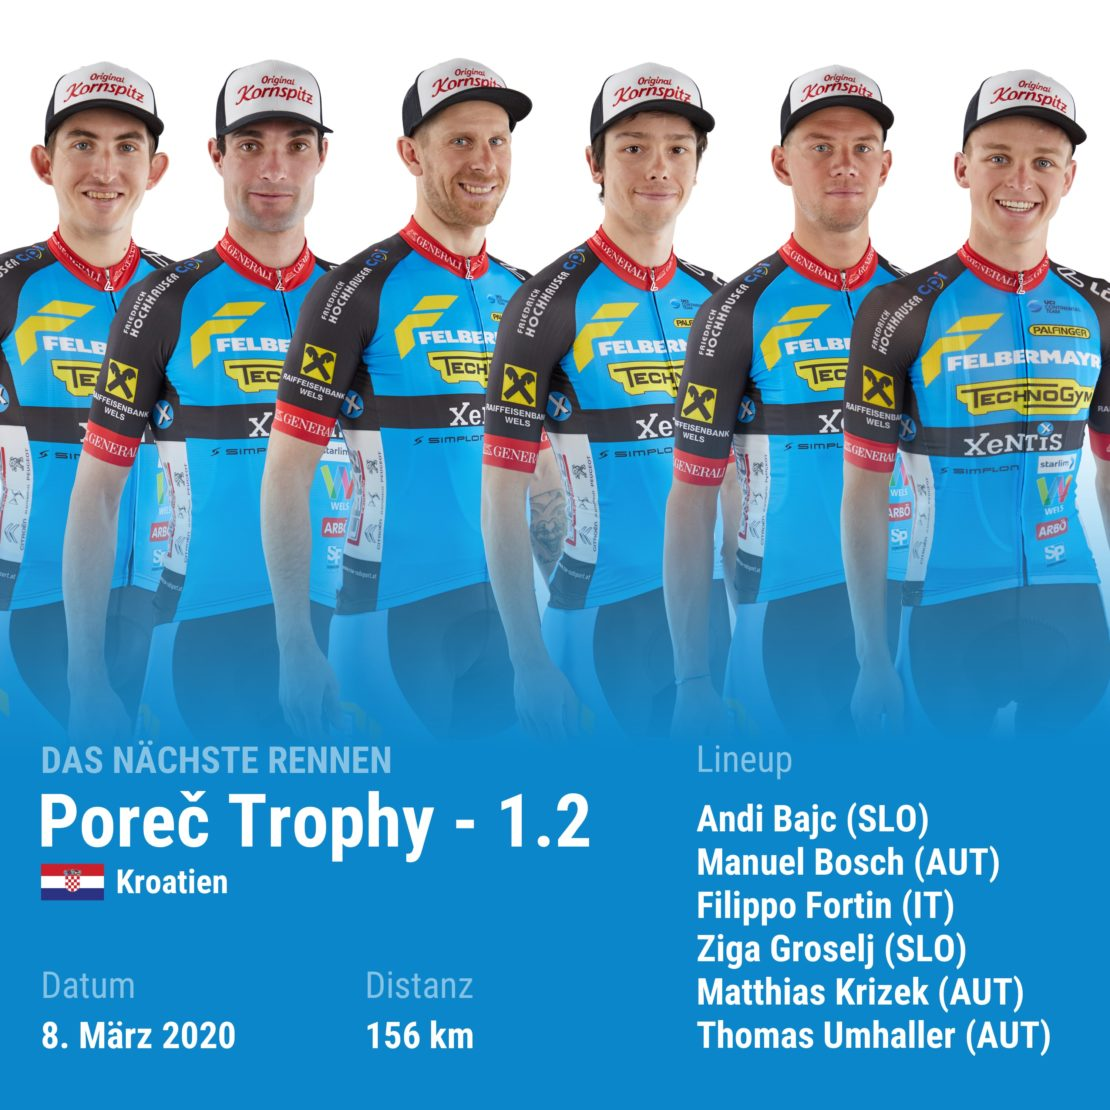 Porec Trophy